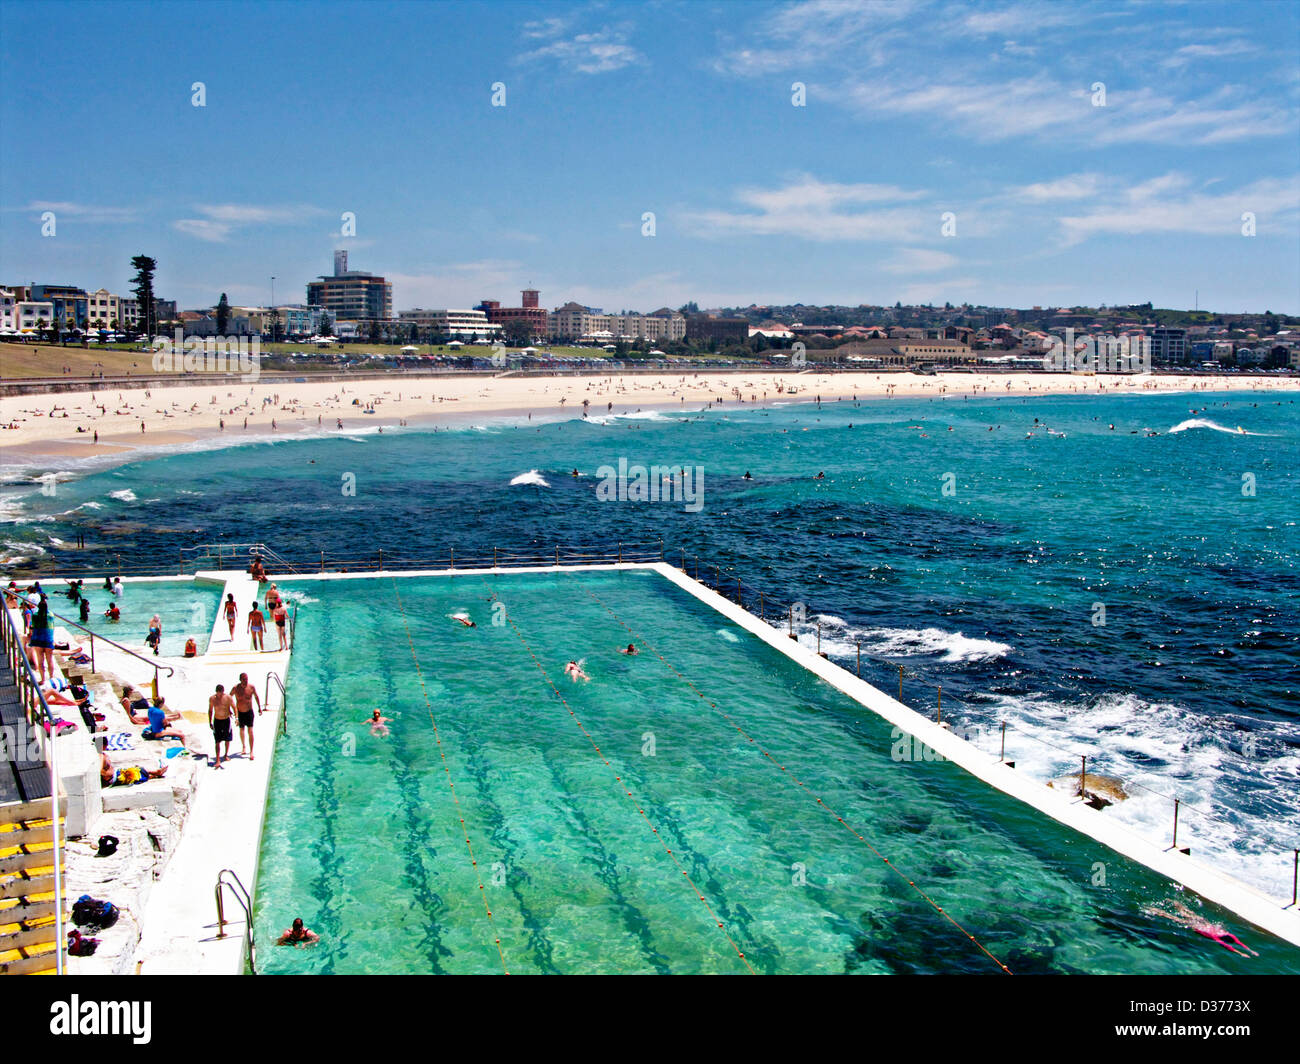 The Outdoor Sea Bondi Baths Swimming Pool At Icebergs